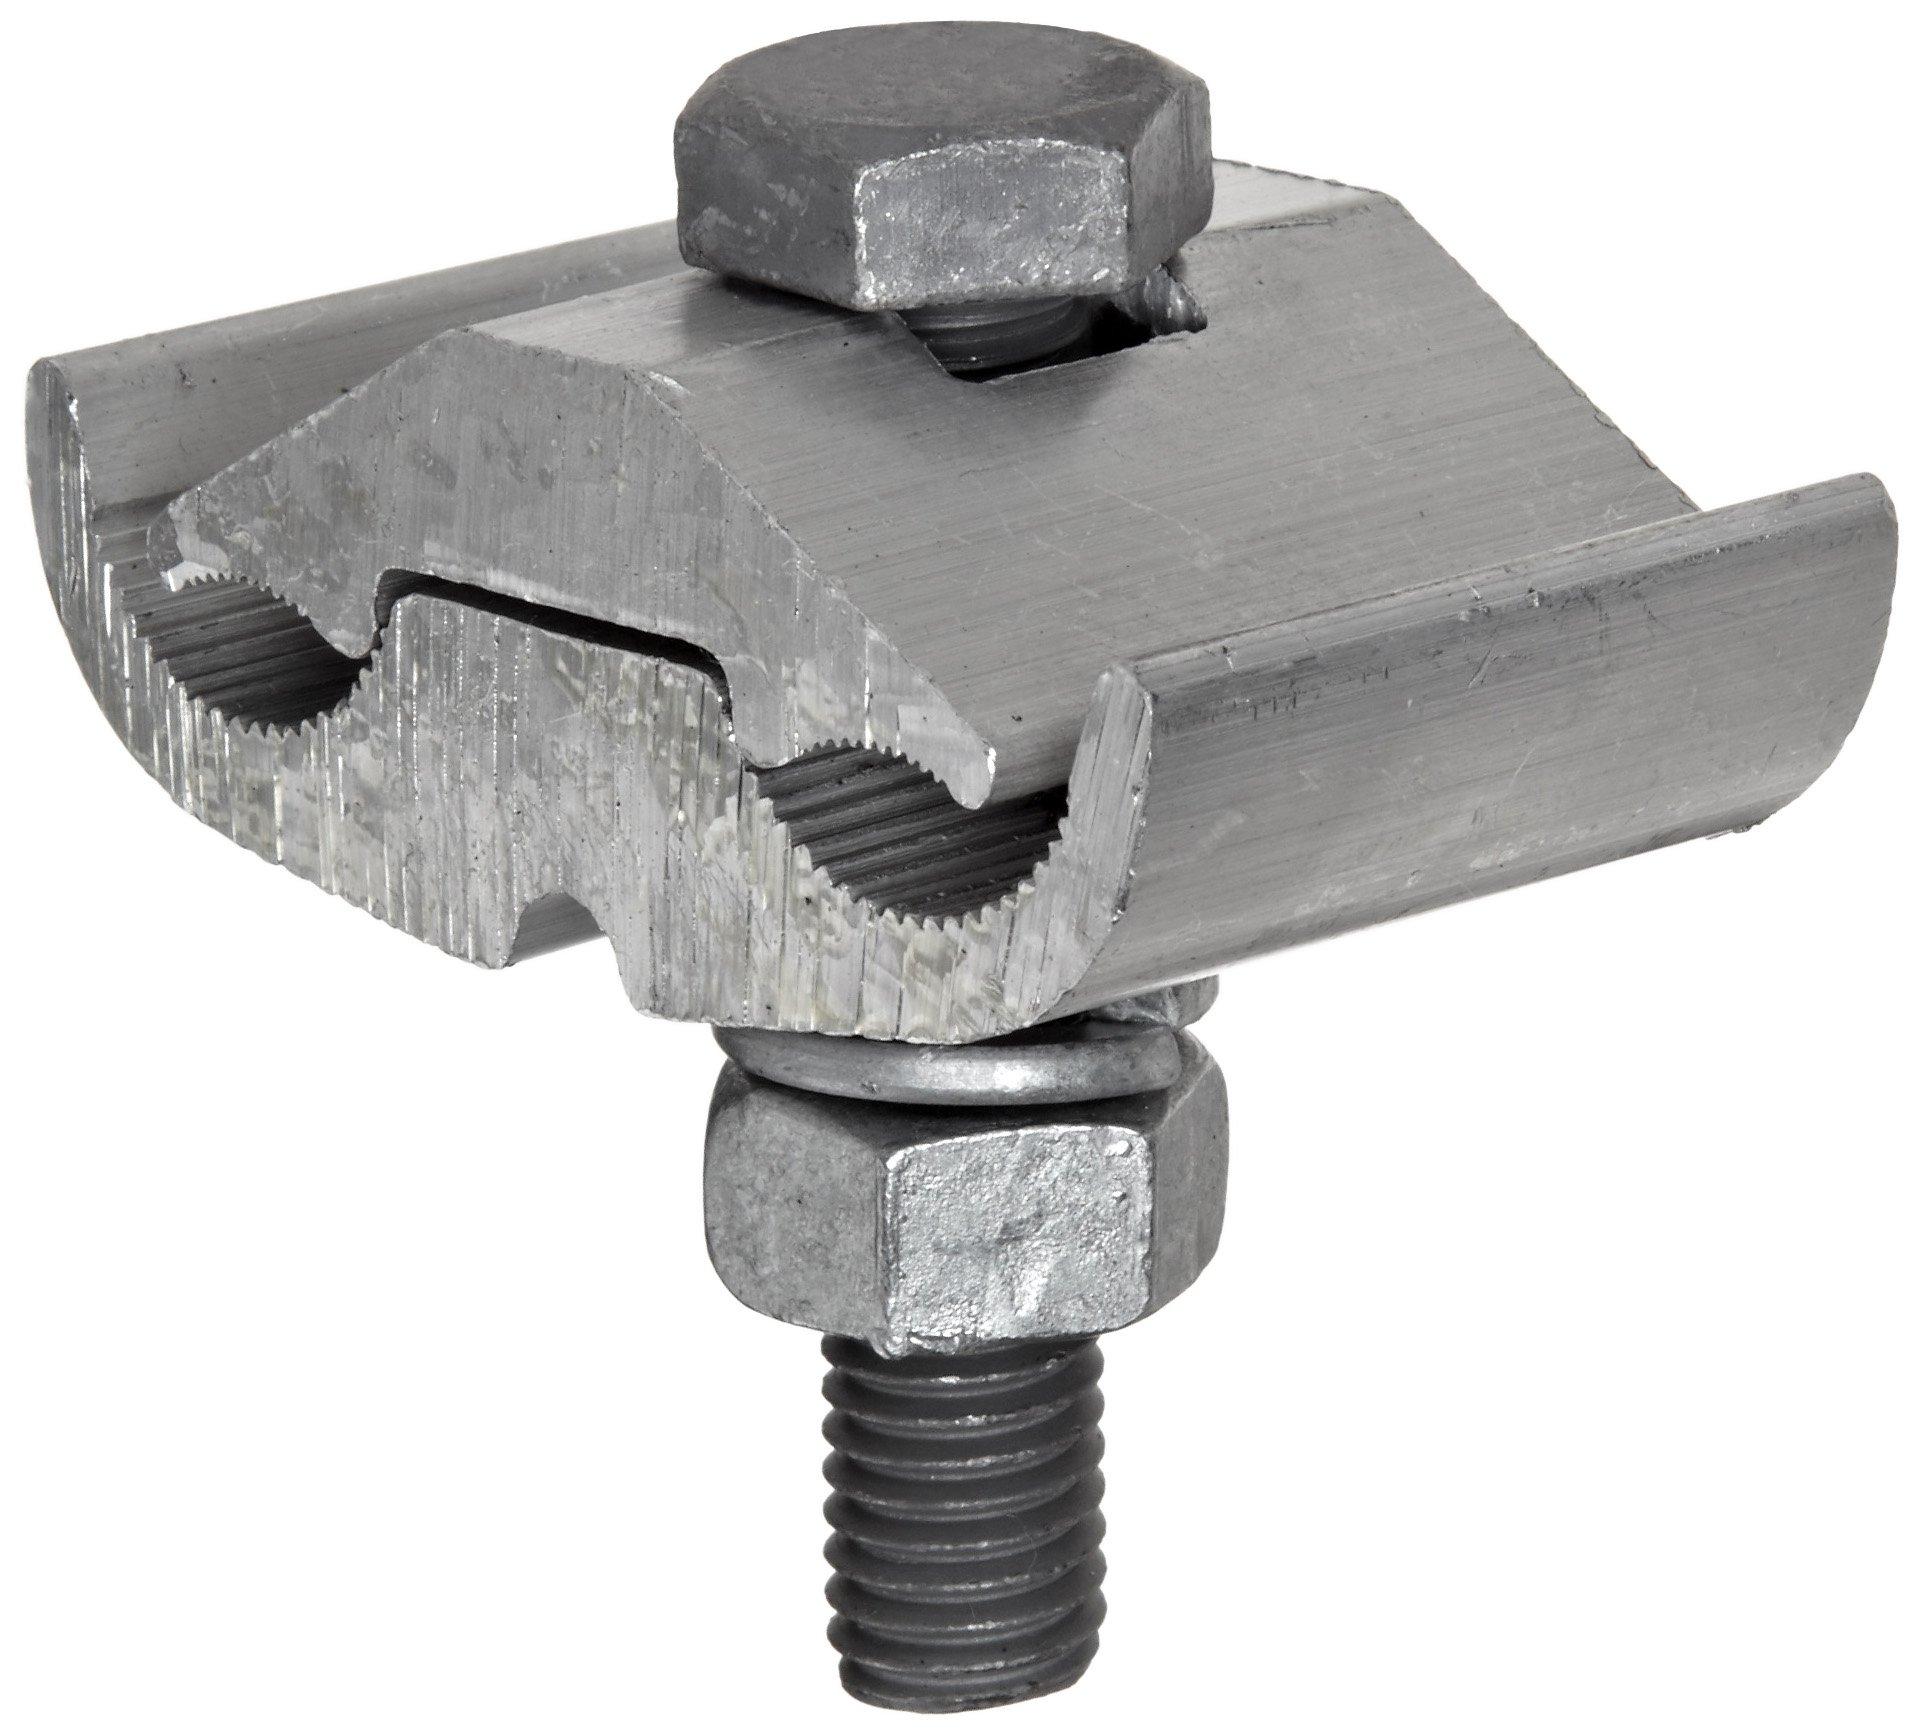 Morris Products 96028 Parallel Groove Clamp, 1 Bolt, Aluminum, 397.5 - 400 CU-AL Main, .728 - .740'' Wire Diameter Main; 397.5 - 400 CU-AL Tap, .728 - .740''